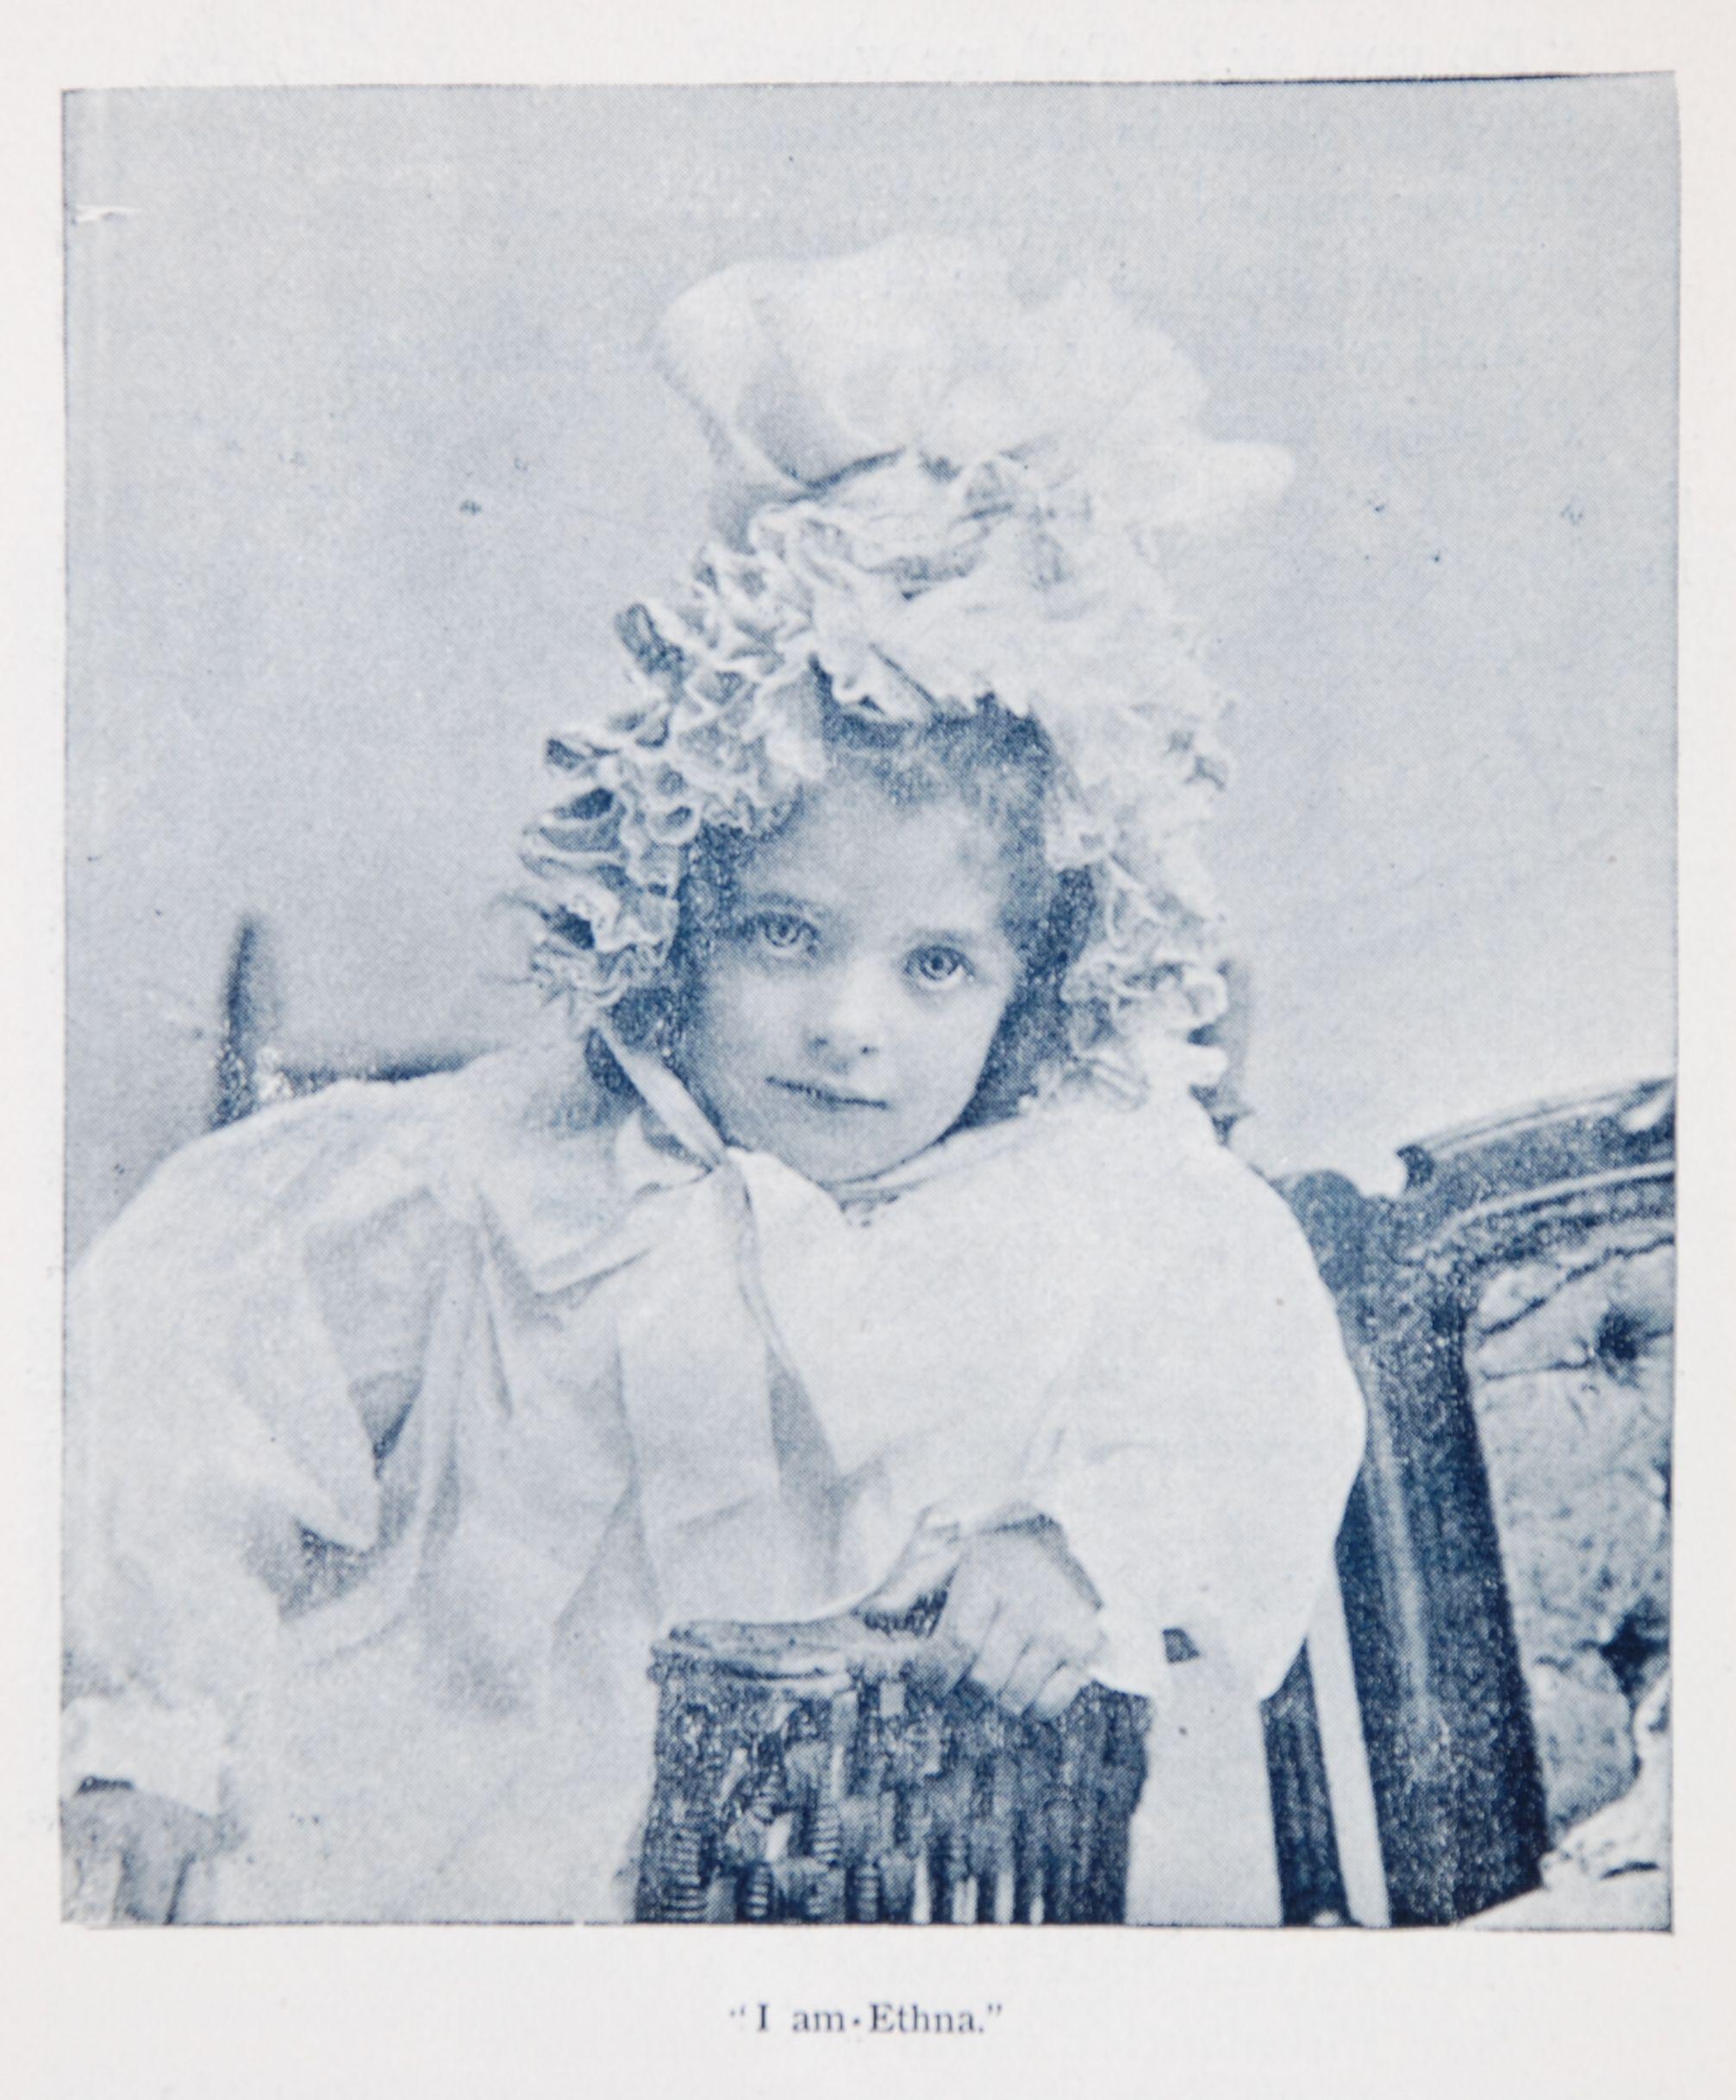 The Dominican Star. Volume 2, Jan 1900. Dunedin, New Zealand Tablet Printing & Publishing Co.; 1900.